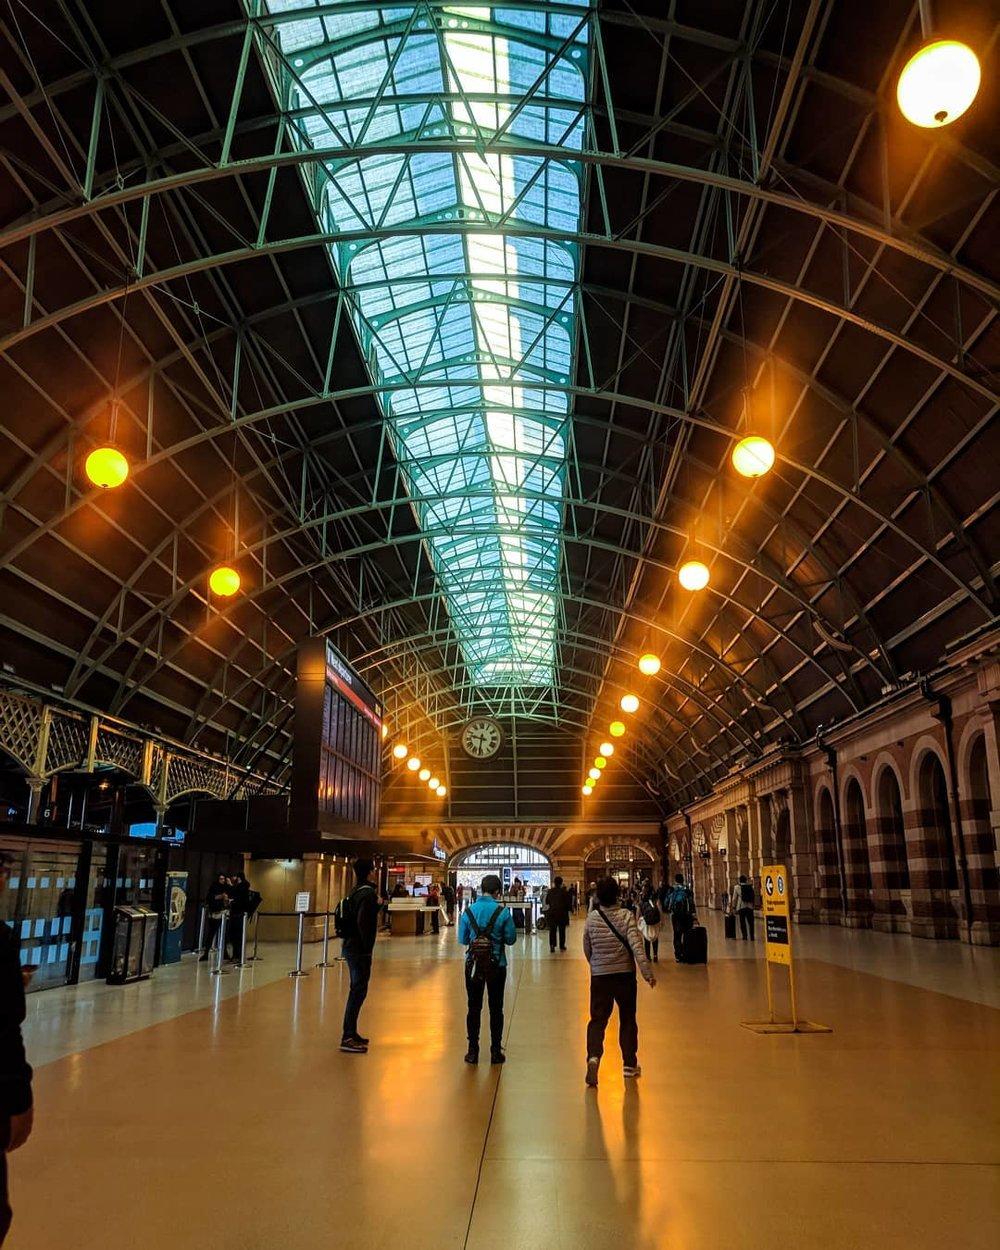 Train station in the Sydney CBD - courtesy of Sage Corps Sydney 2018 fellow, Avia.